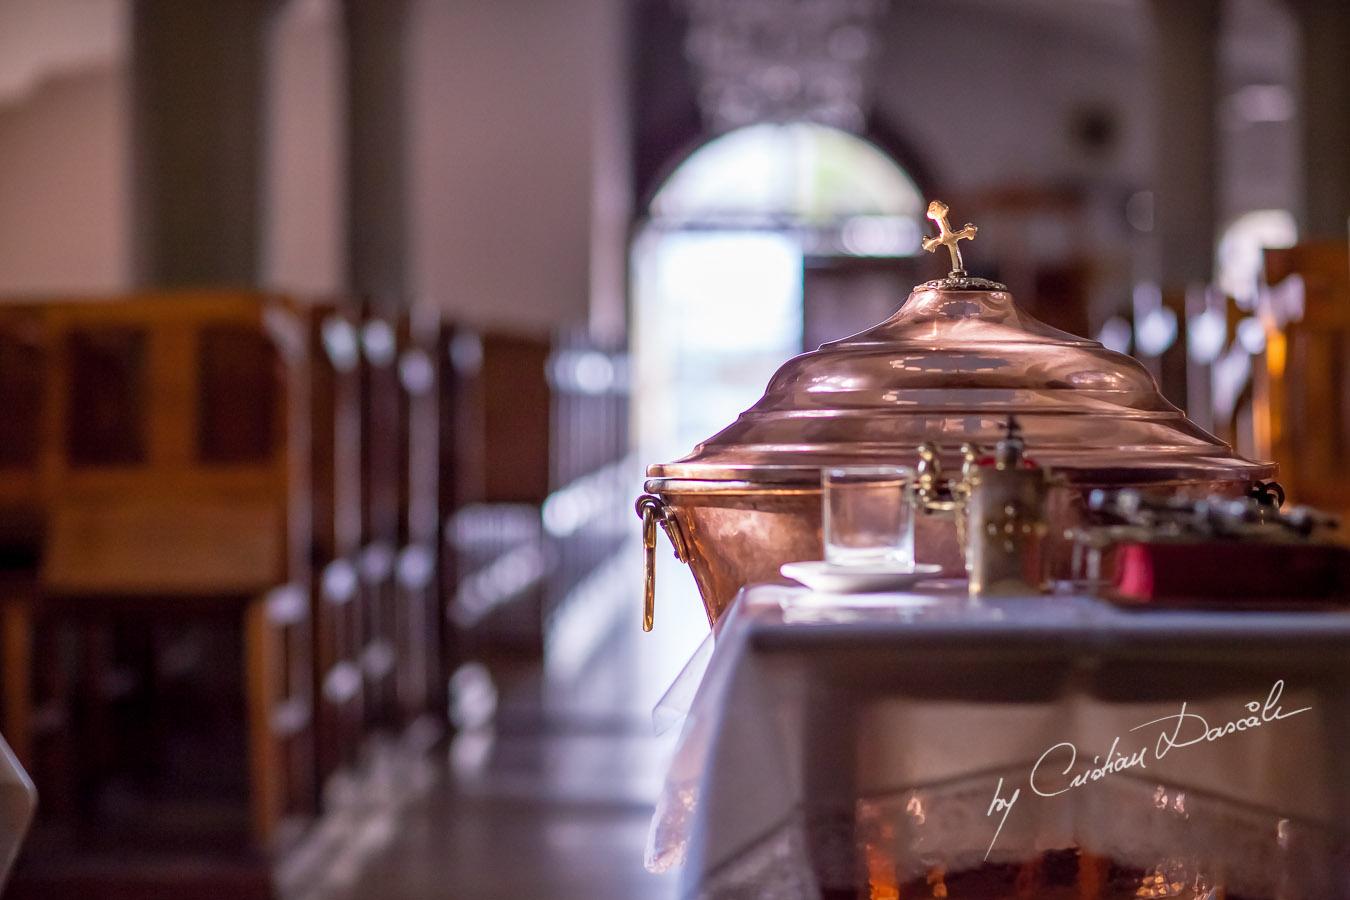 Christening Photography - A Touching Christening Tale. Photographer: Cristian Dascalu